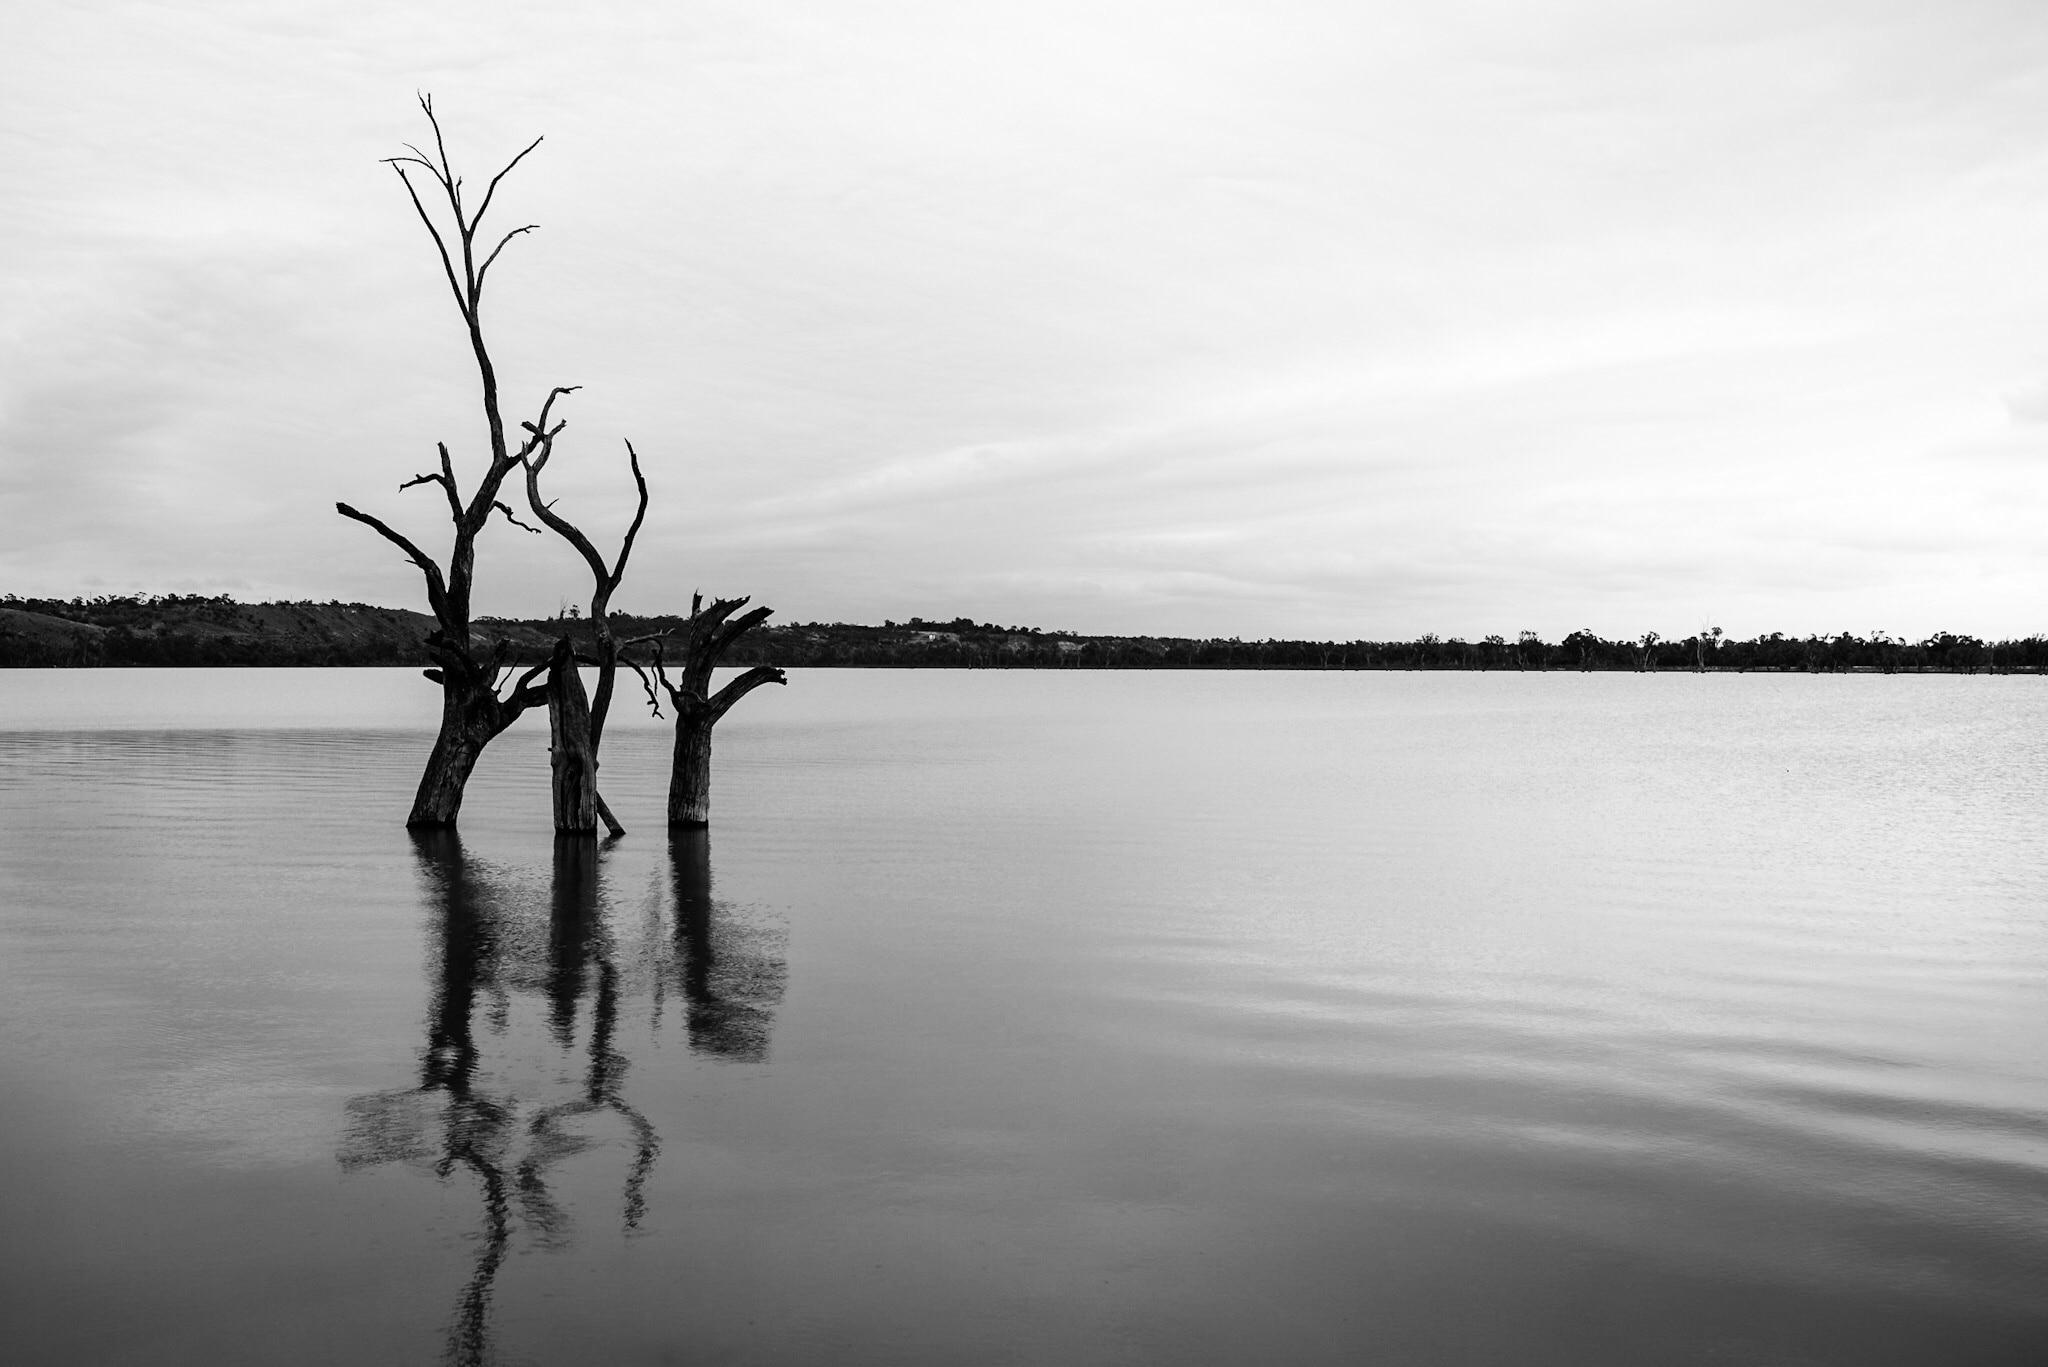 The District Council of Loxton Waikerie, South Australia, Australia